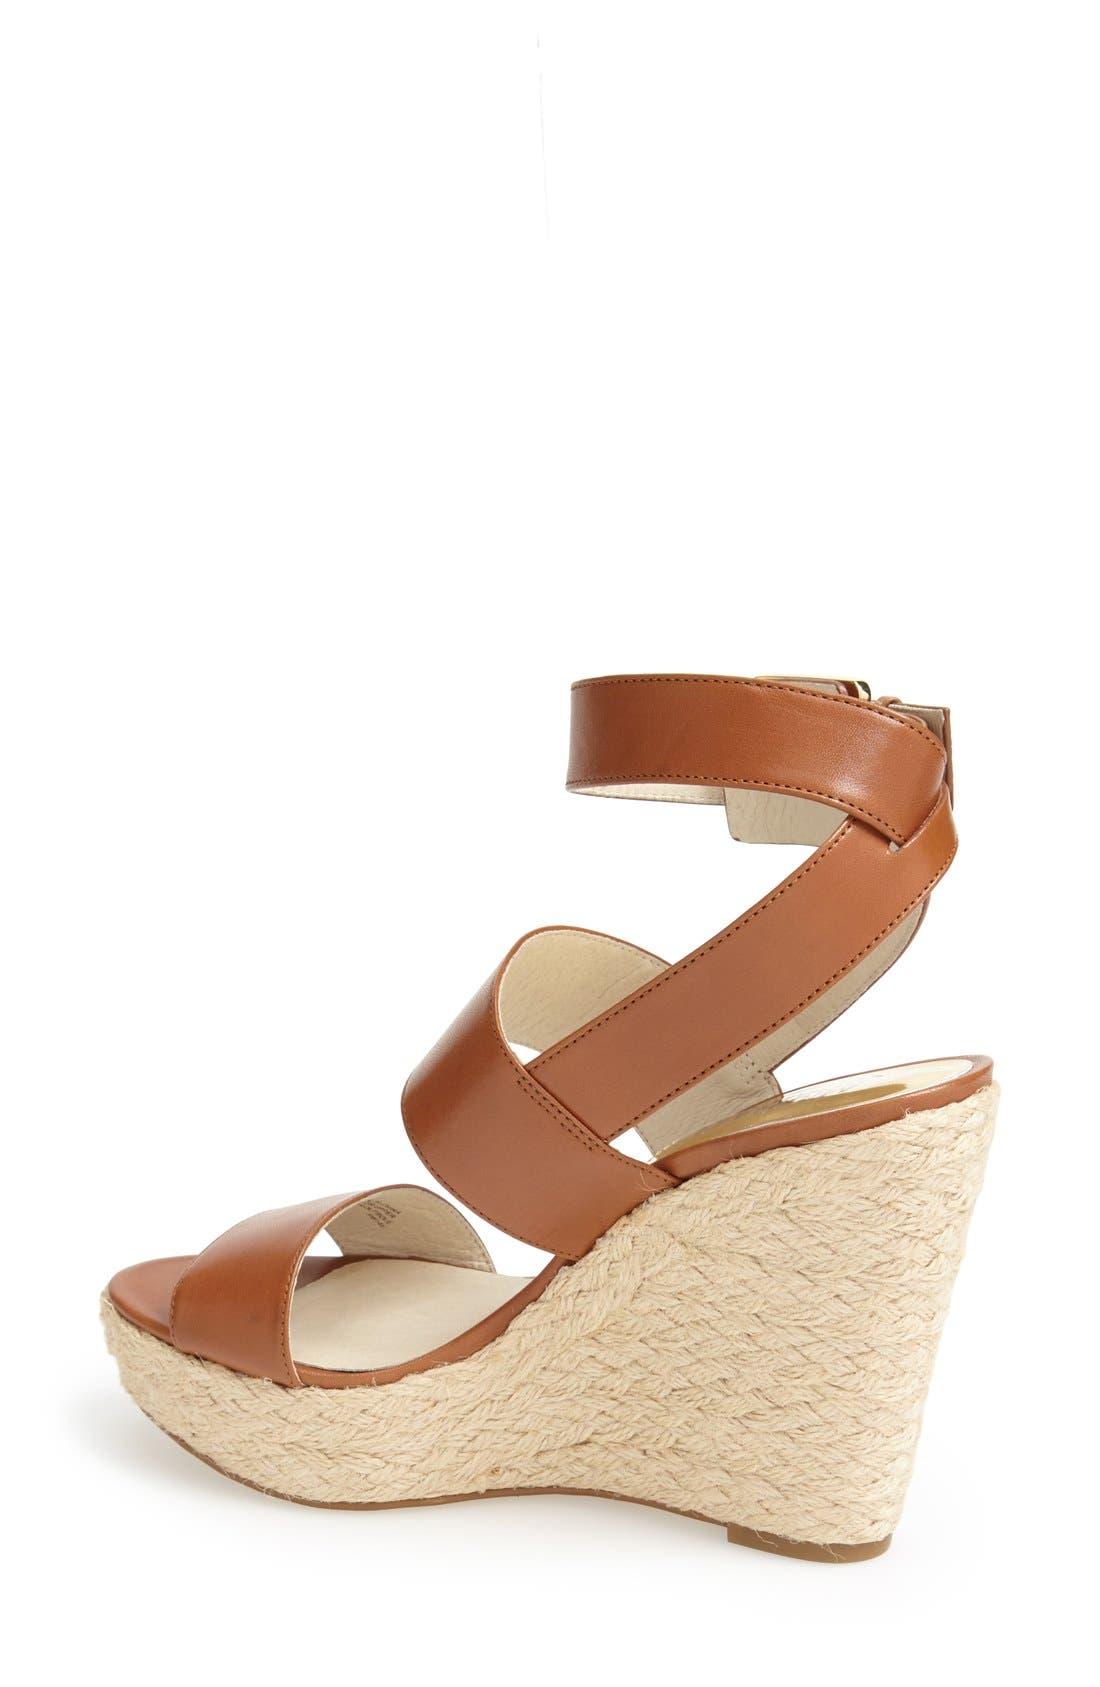 Alternate Image 2  - MICHAEL Michael Kors 'Posey' Ankle Strap Espadrille Wedge Sandal (Women)